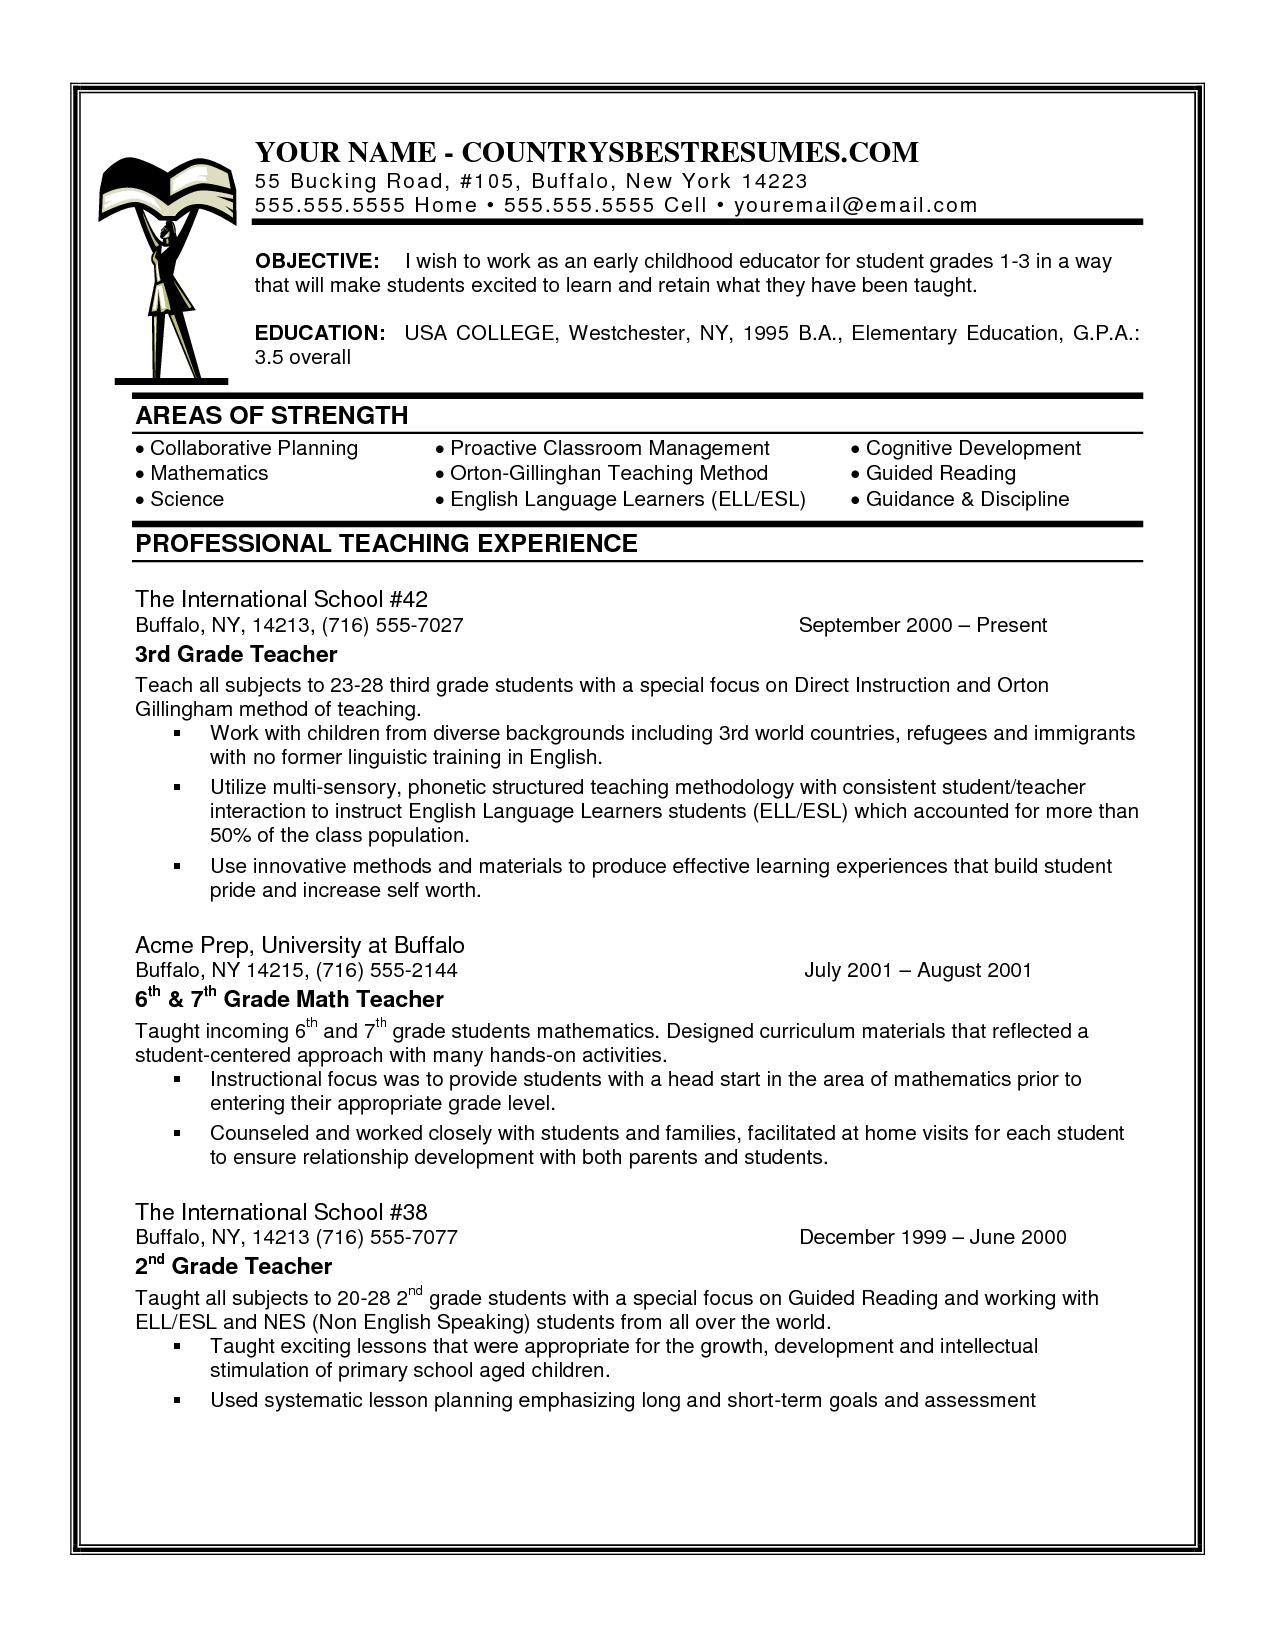 Sample Resumes For Middle School Principals Mmim8kzn